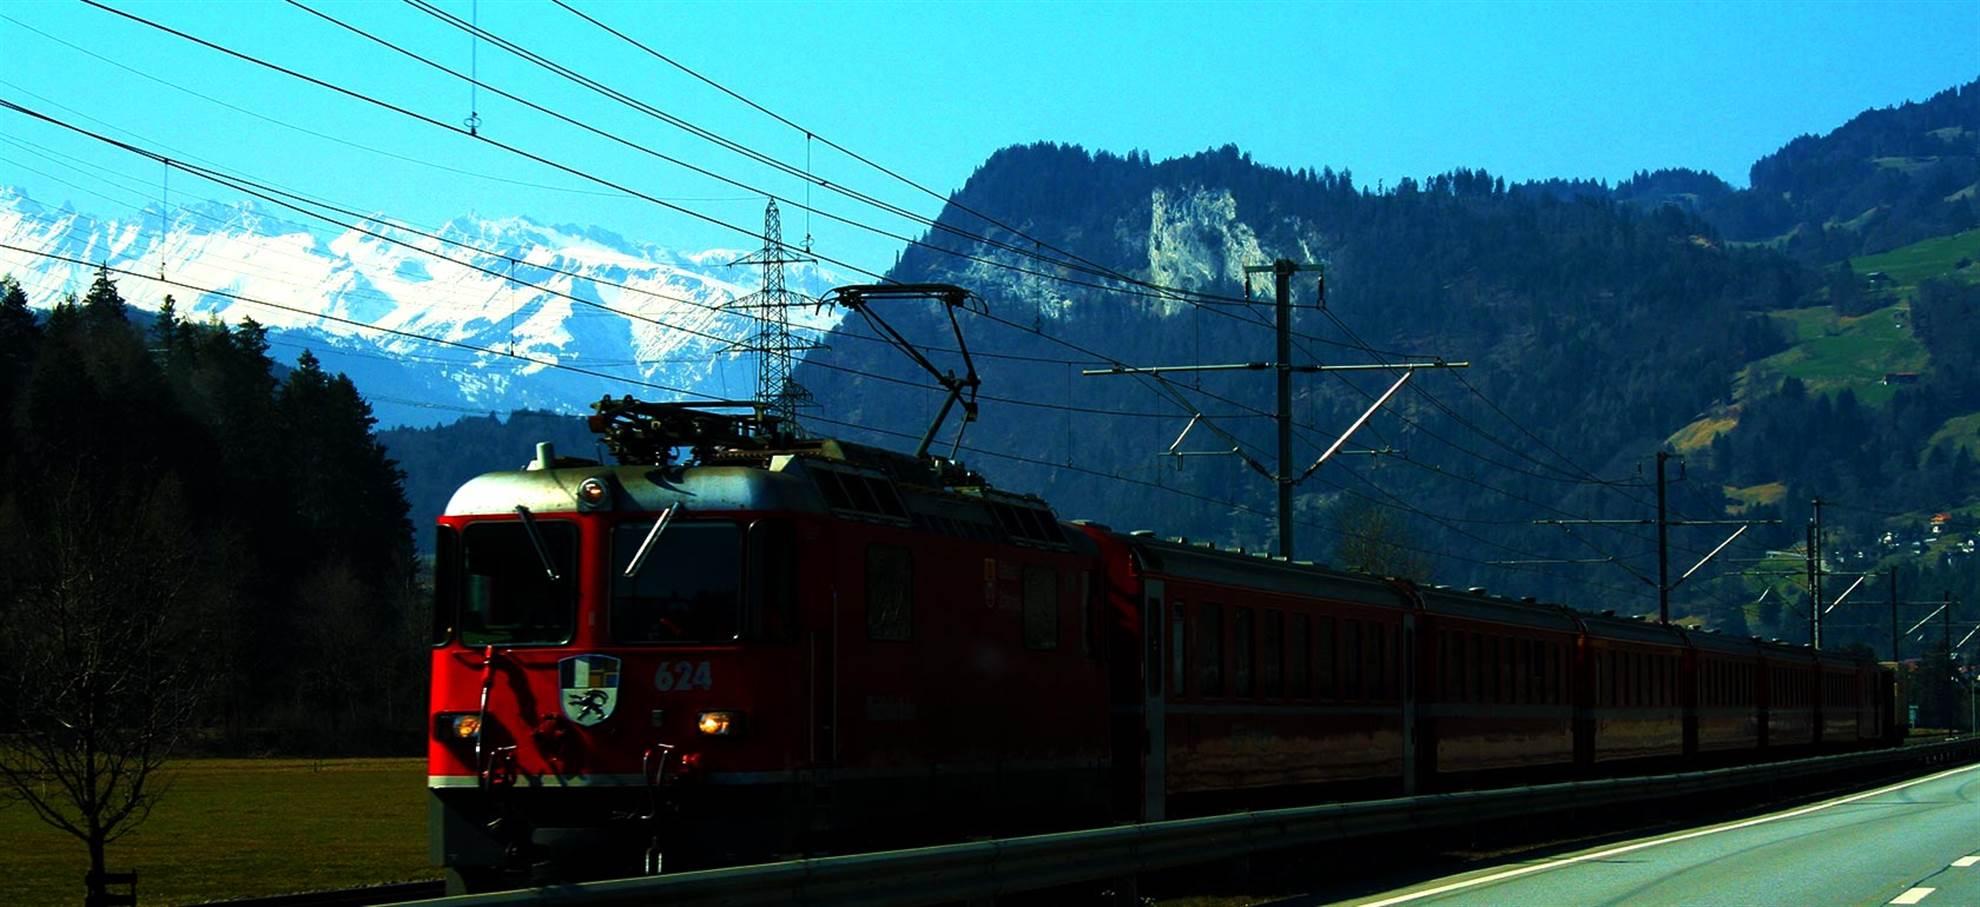 Bilhete de comboio de Munique até Neuschwanstein: Bilhete de Bayern